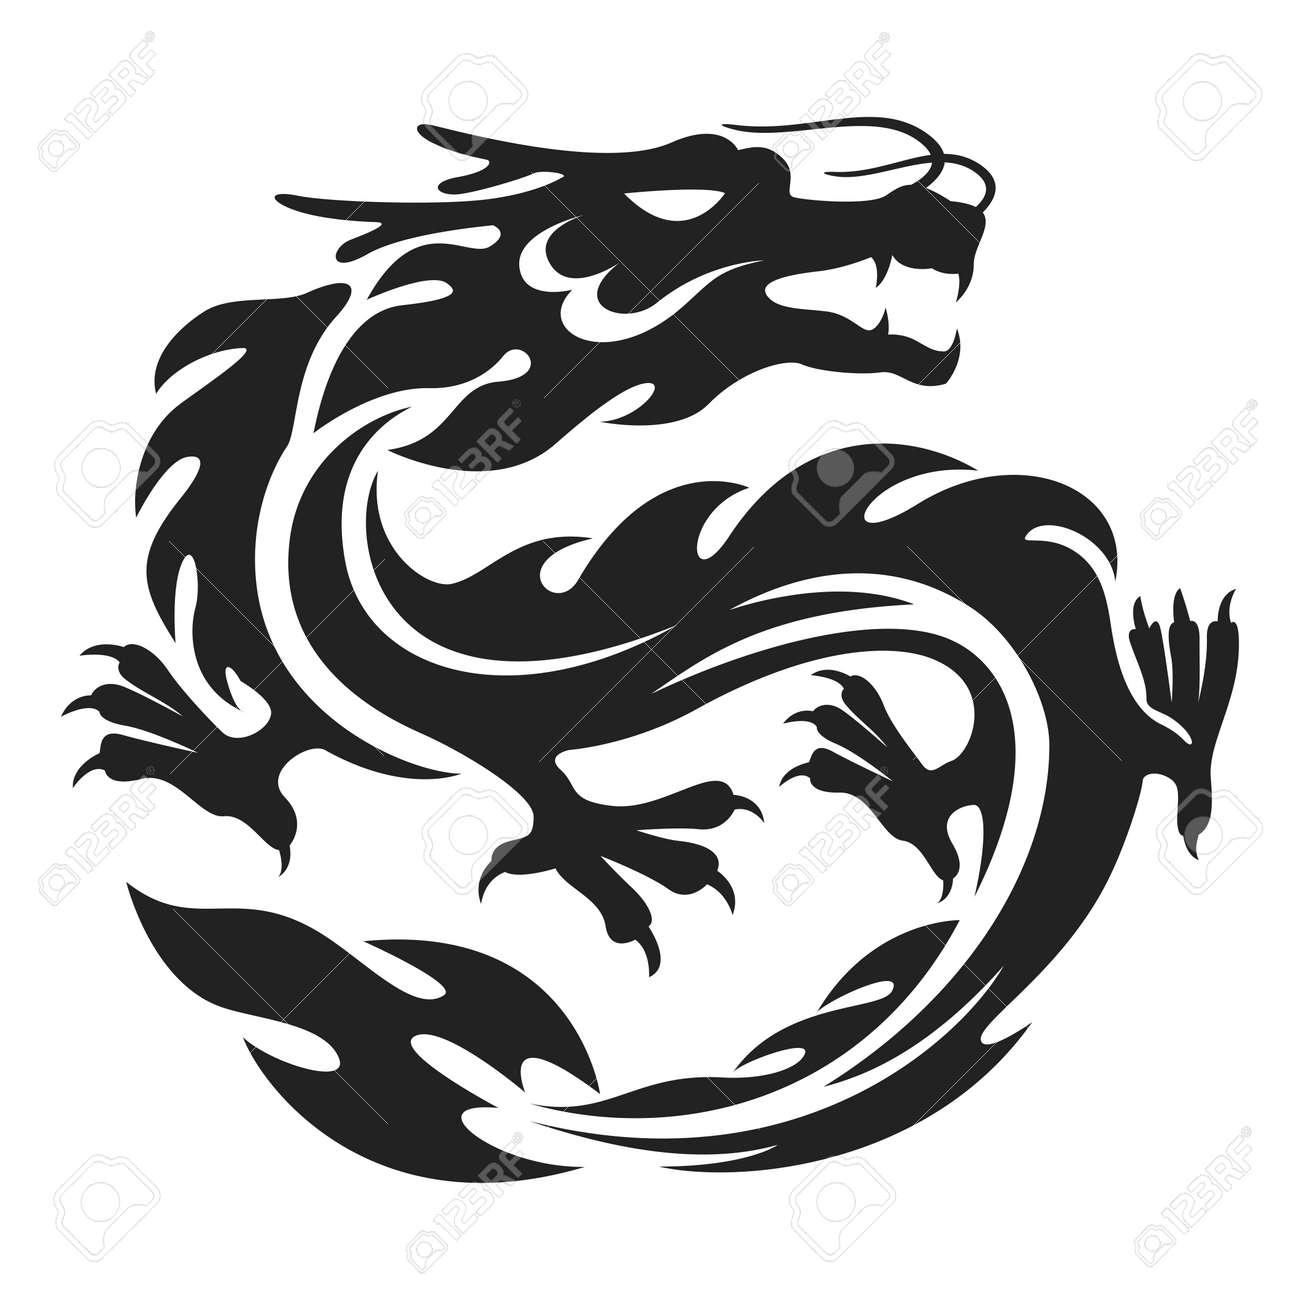 13 792 chinese dragon stock vector illustration and royalty free rh 123rf com chinese dragon vector circle oriental dragon vector